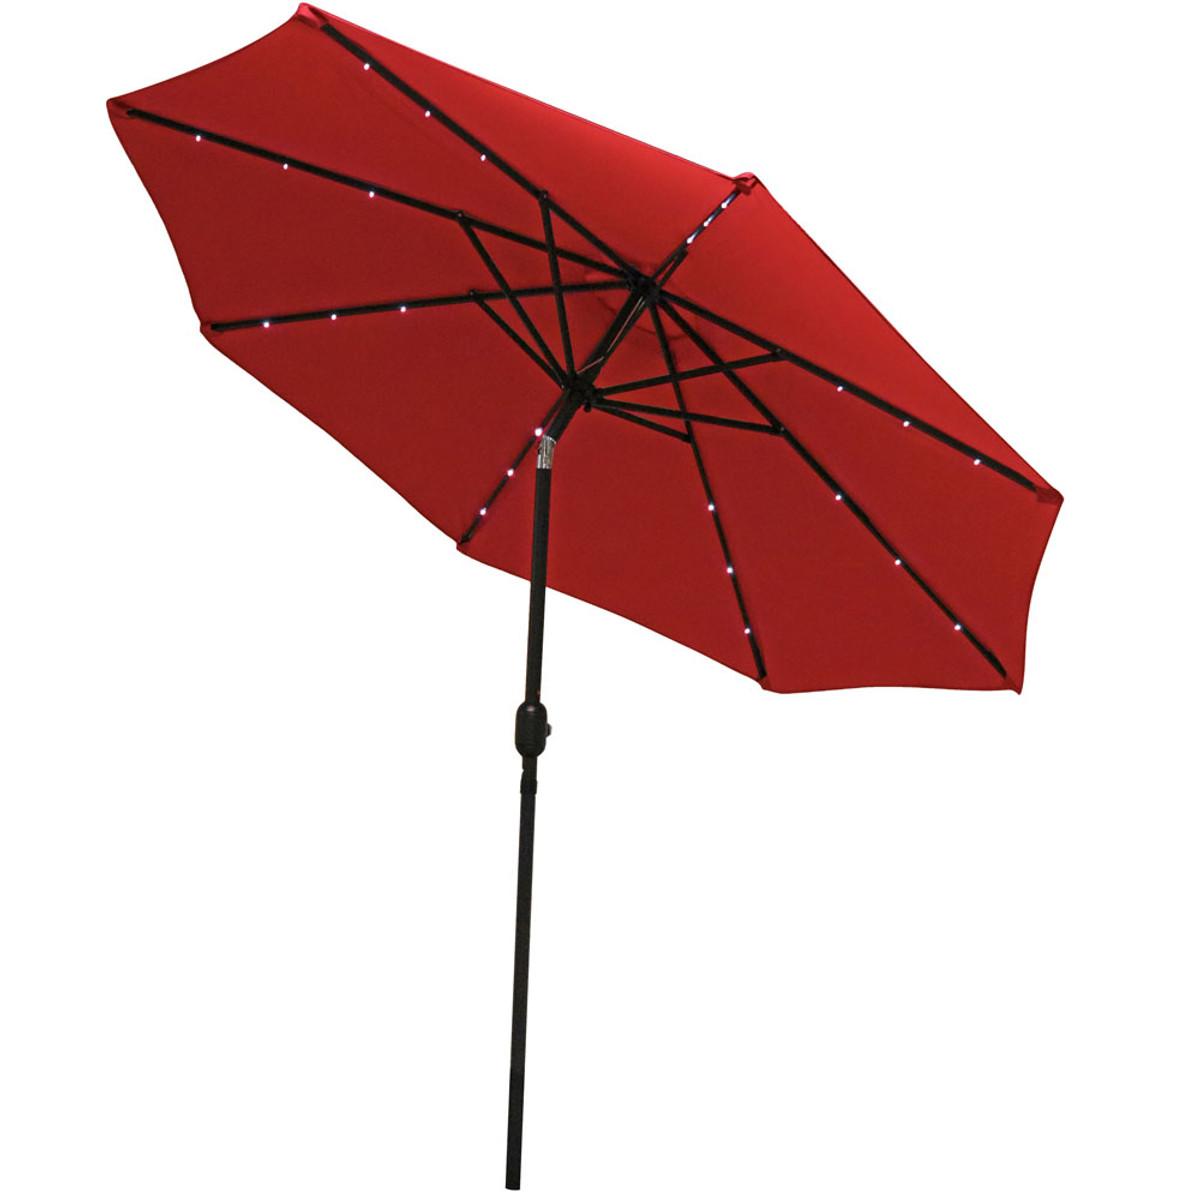 Sunnydaze Solar Powered Patio Umbrella With Led Lights